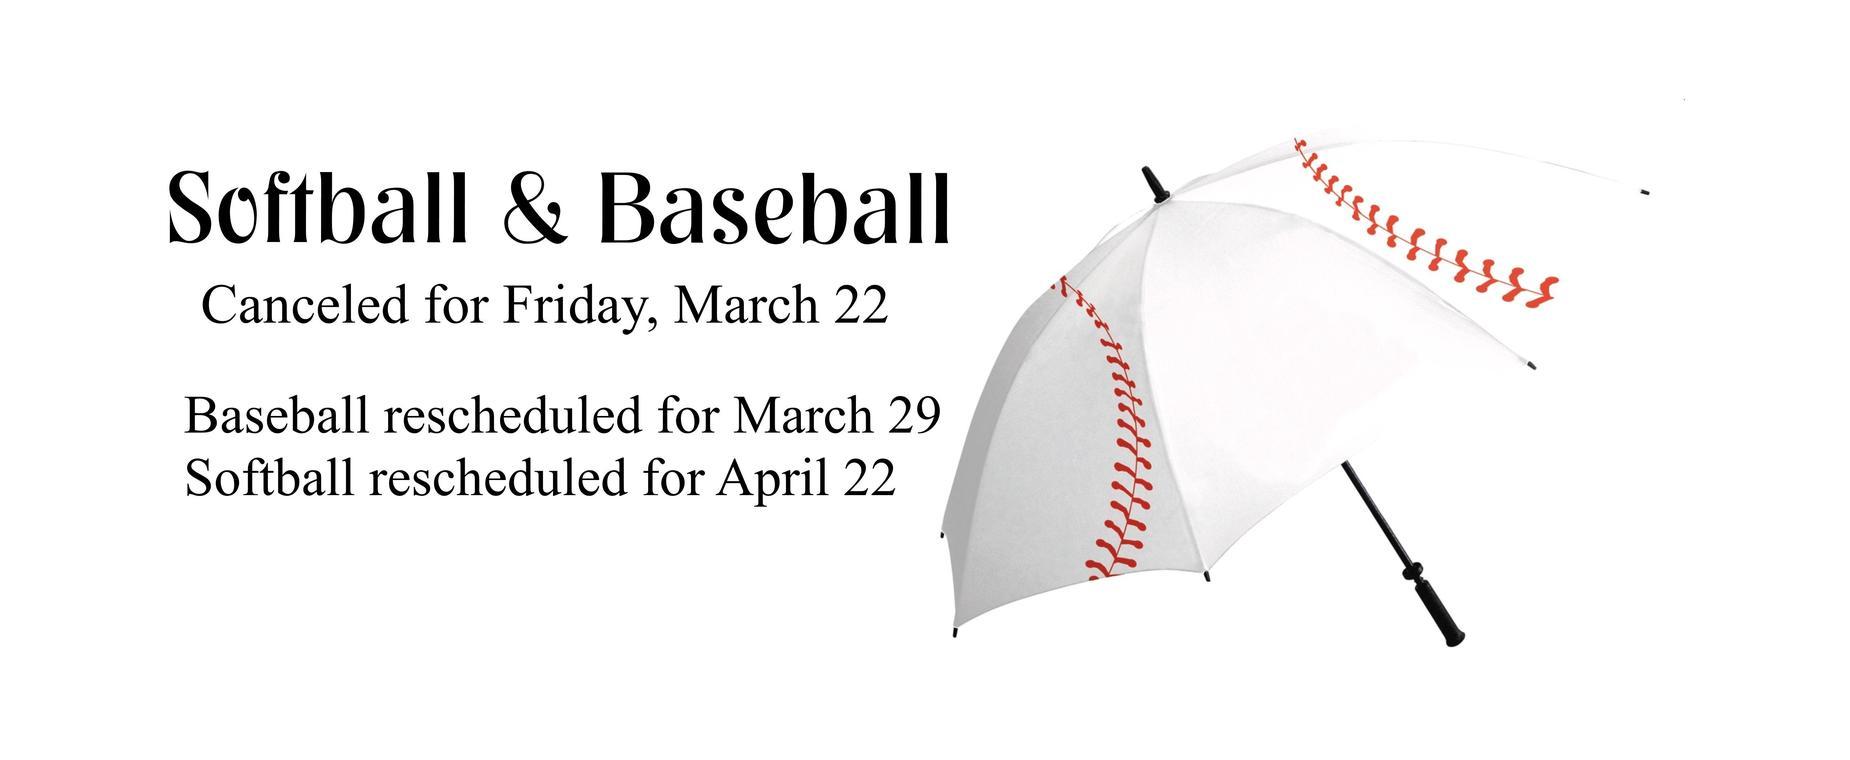 baseball and softball canceled for today